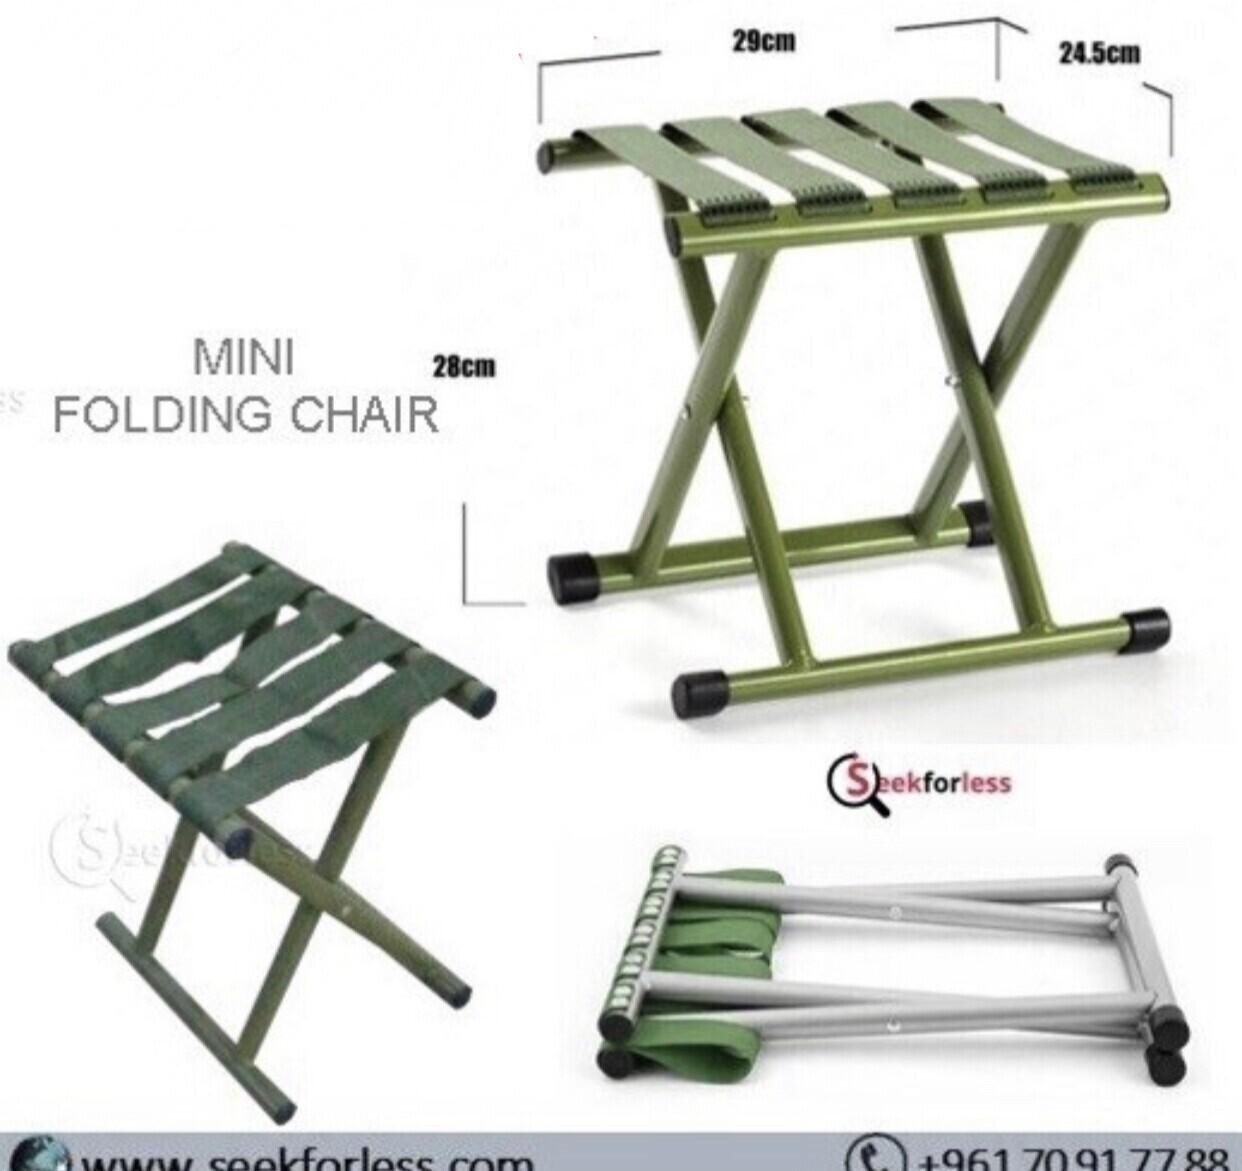 Mini Folding Chair